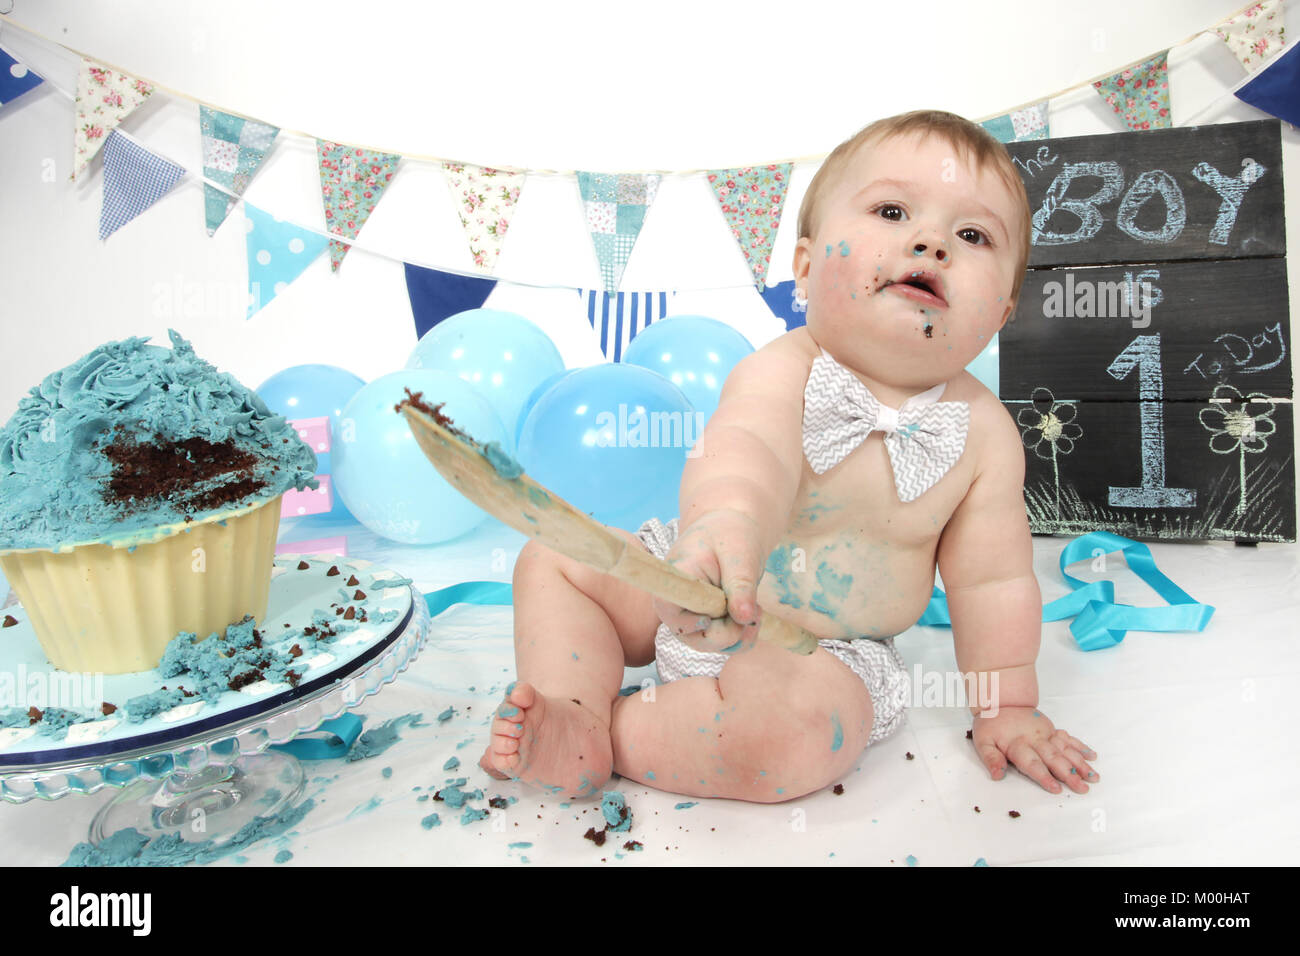 1 Year Old Boy Birthday Party Cake Smash Fun Food